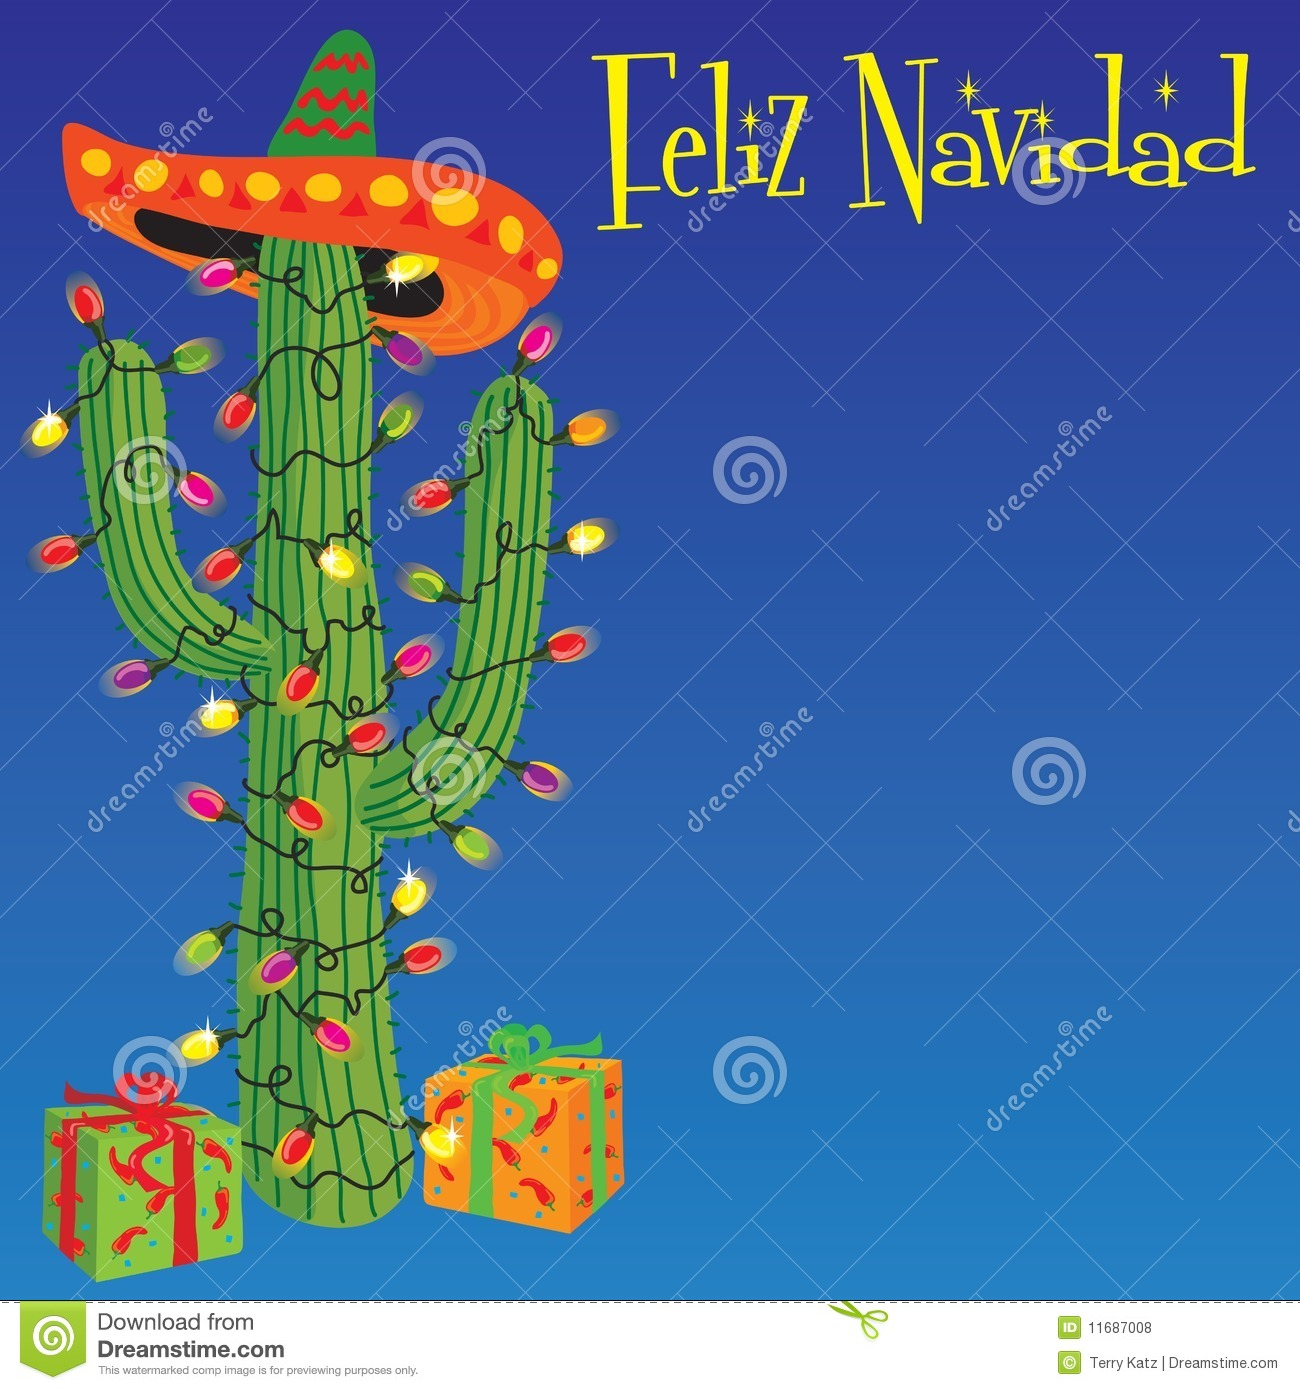 Free Feliz Navidad Clipart.